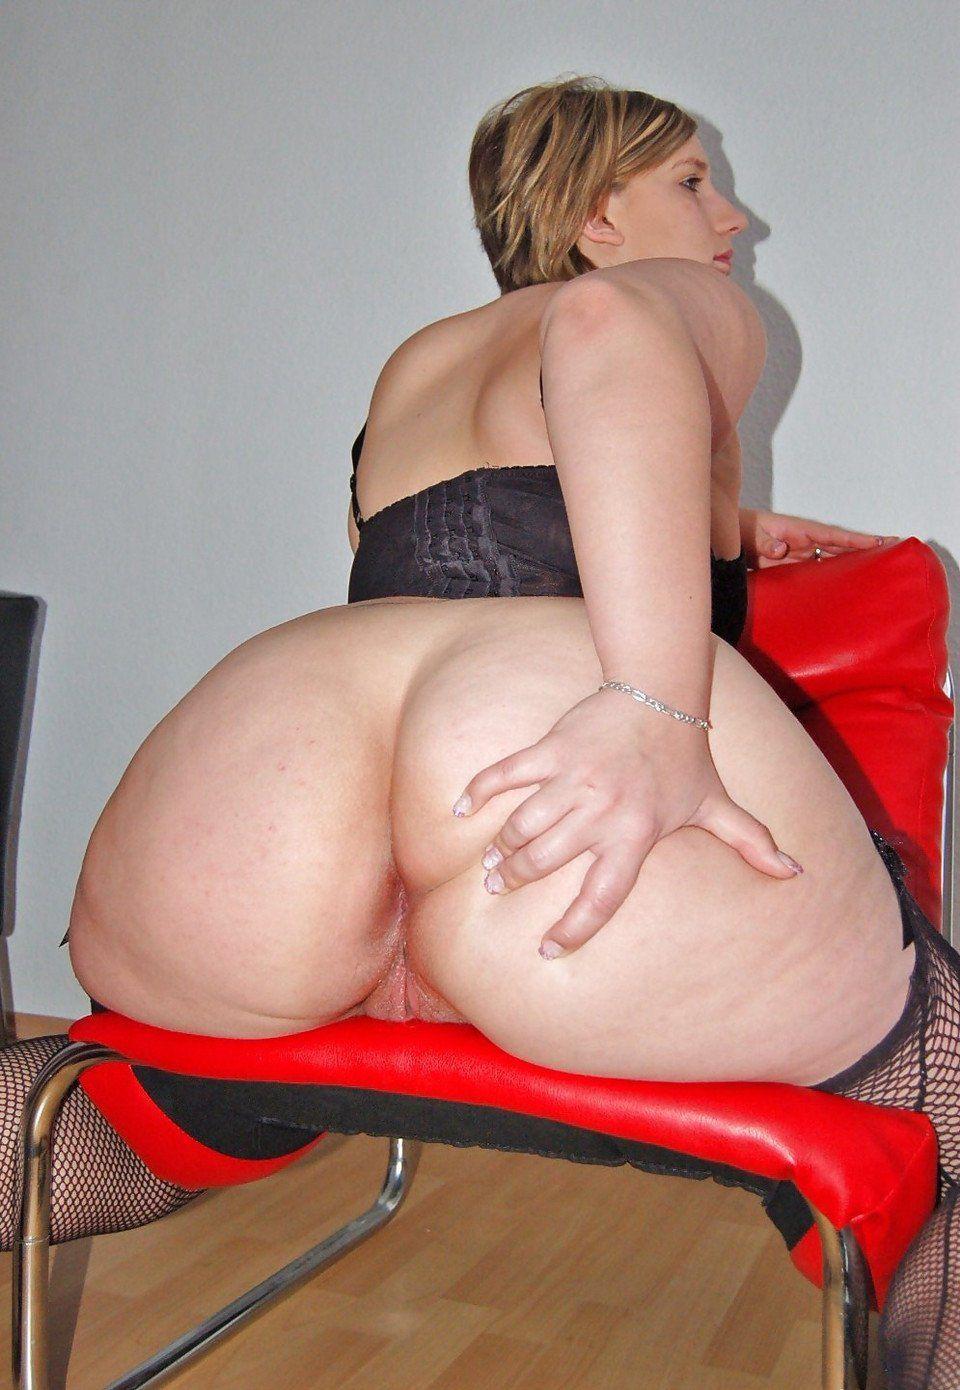 Huge woman assholes random photo gallery